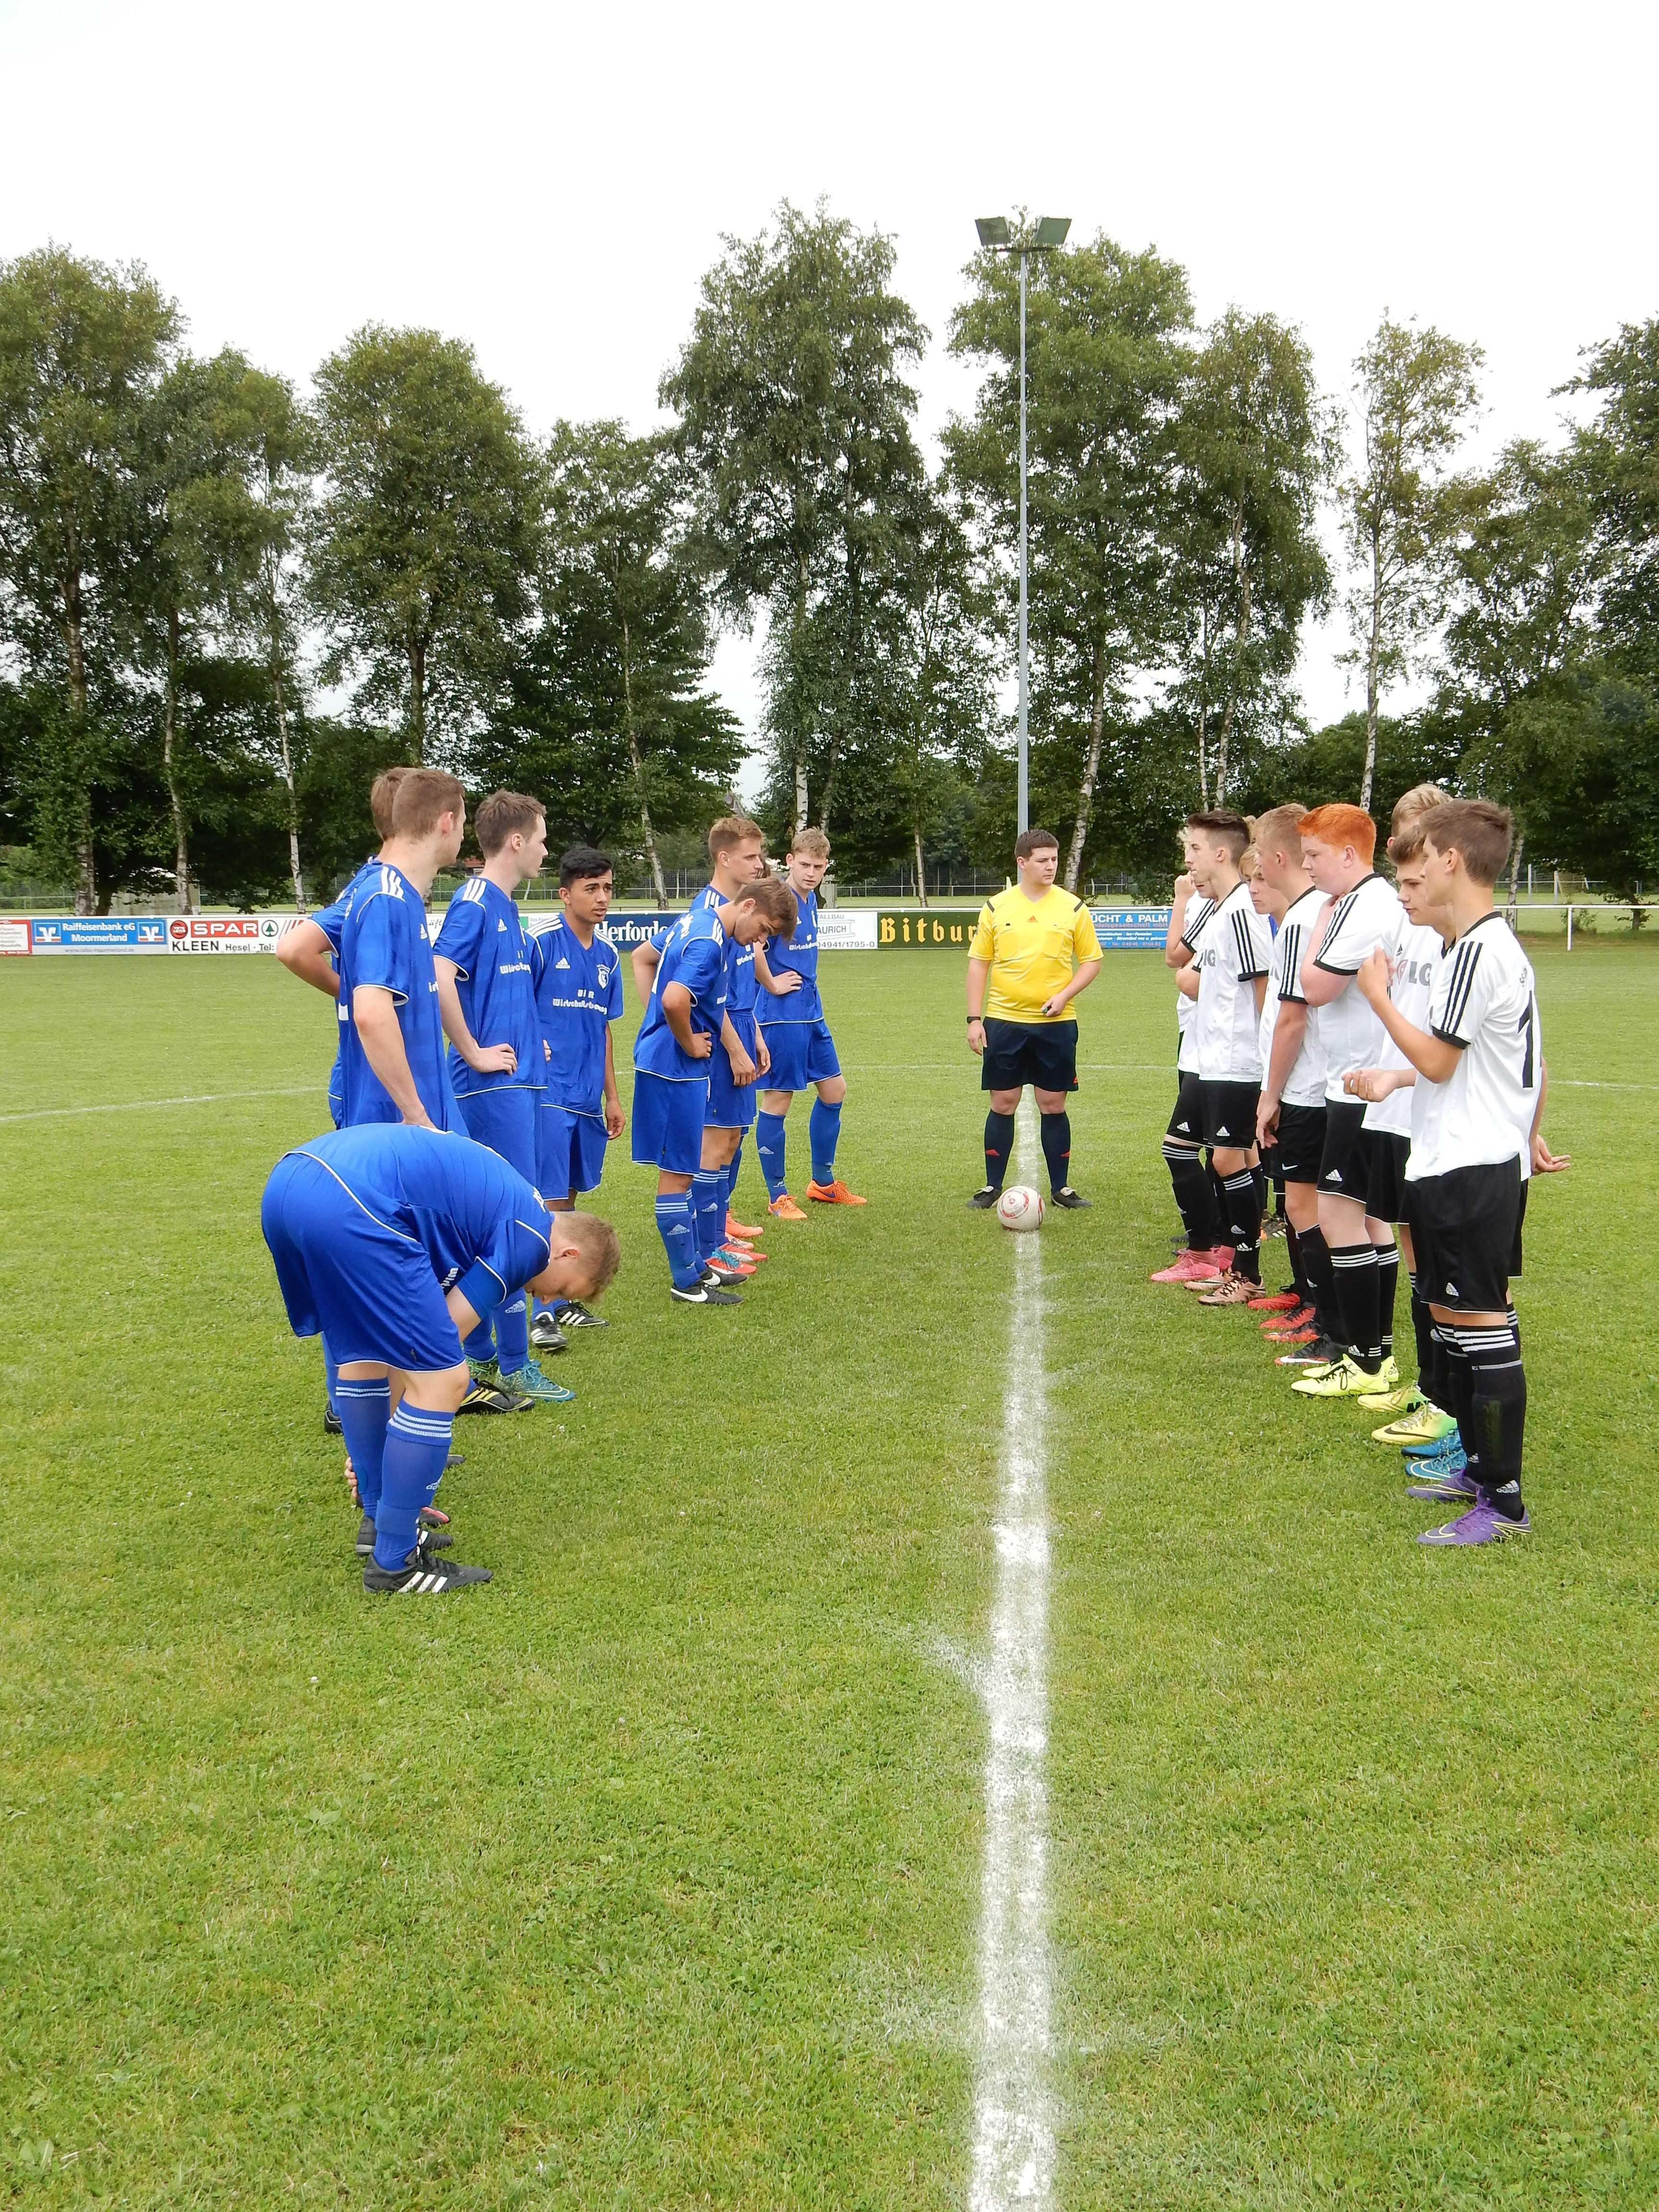 2016-07-28 Sportwoche - erster Donnerstag (24)